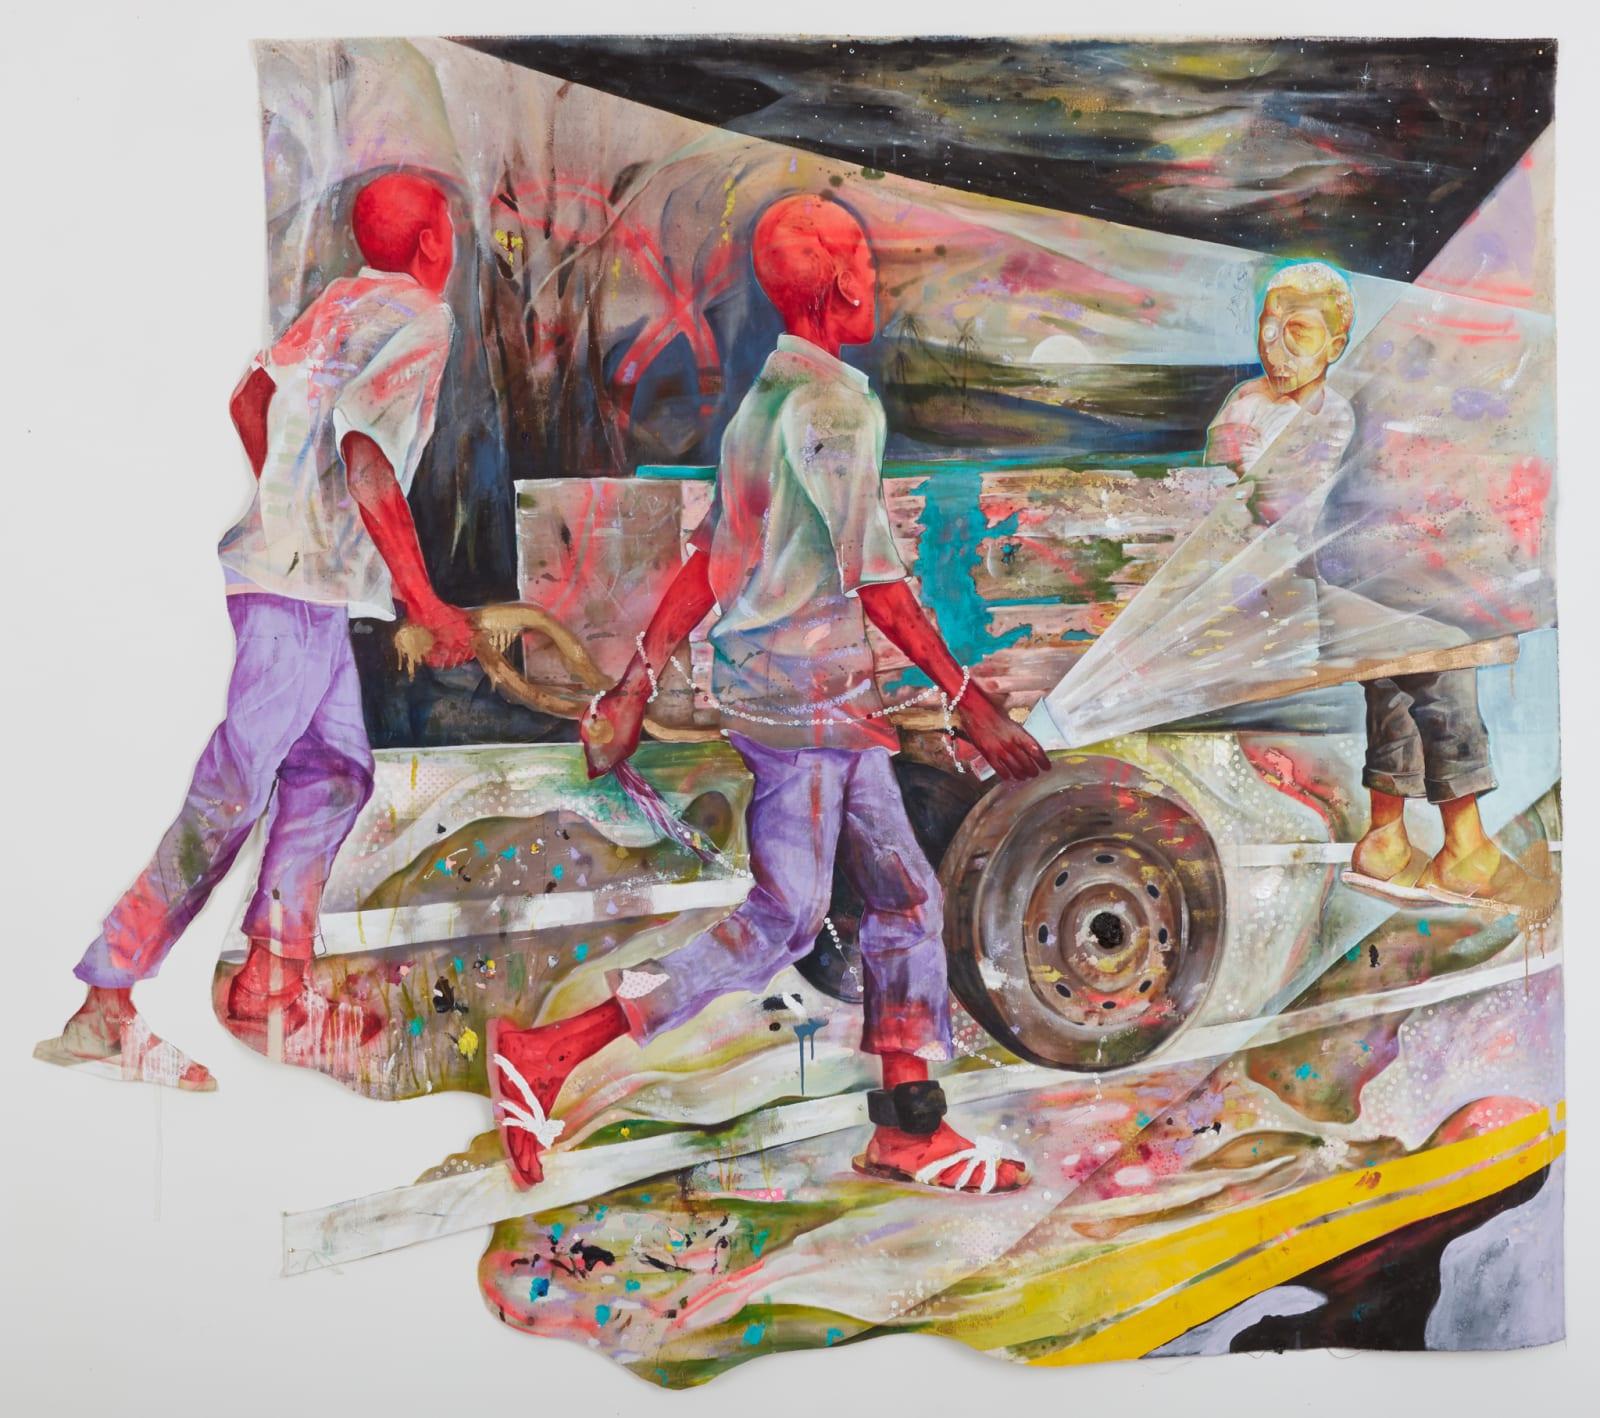 Lavar Munroe  A Stranger, 2019  Acrylic on unprimed canvas  84 x 96 in  213.4 x 243.8 cm